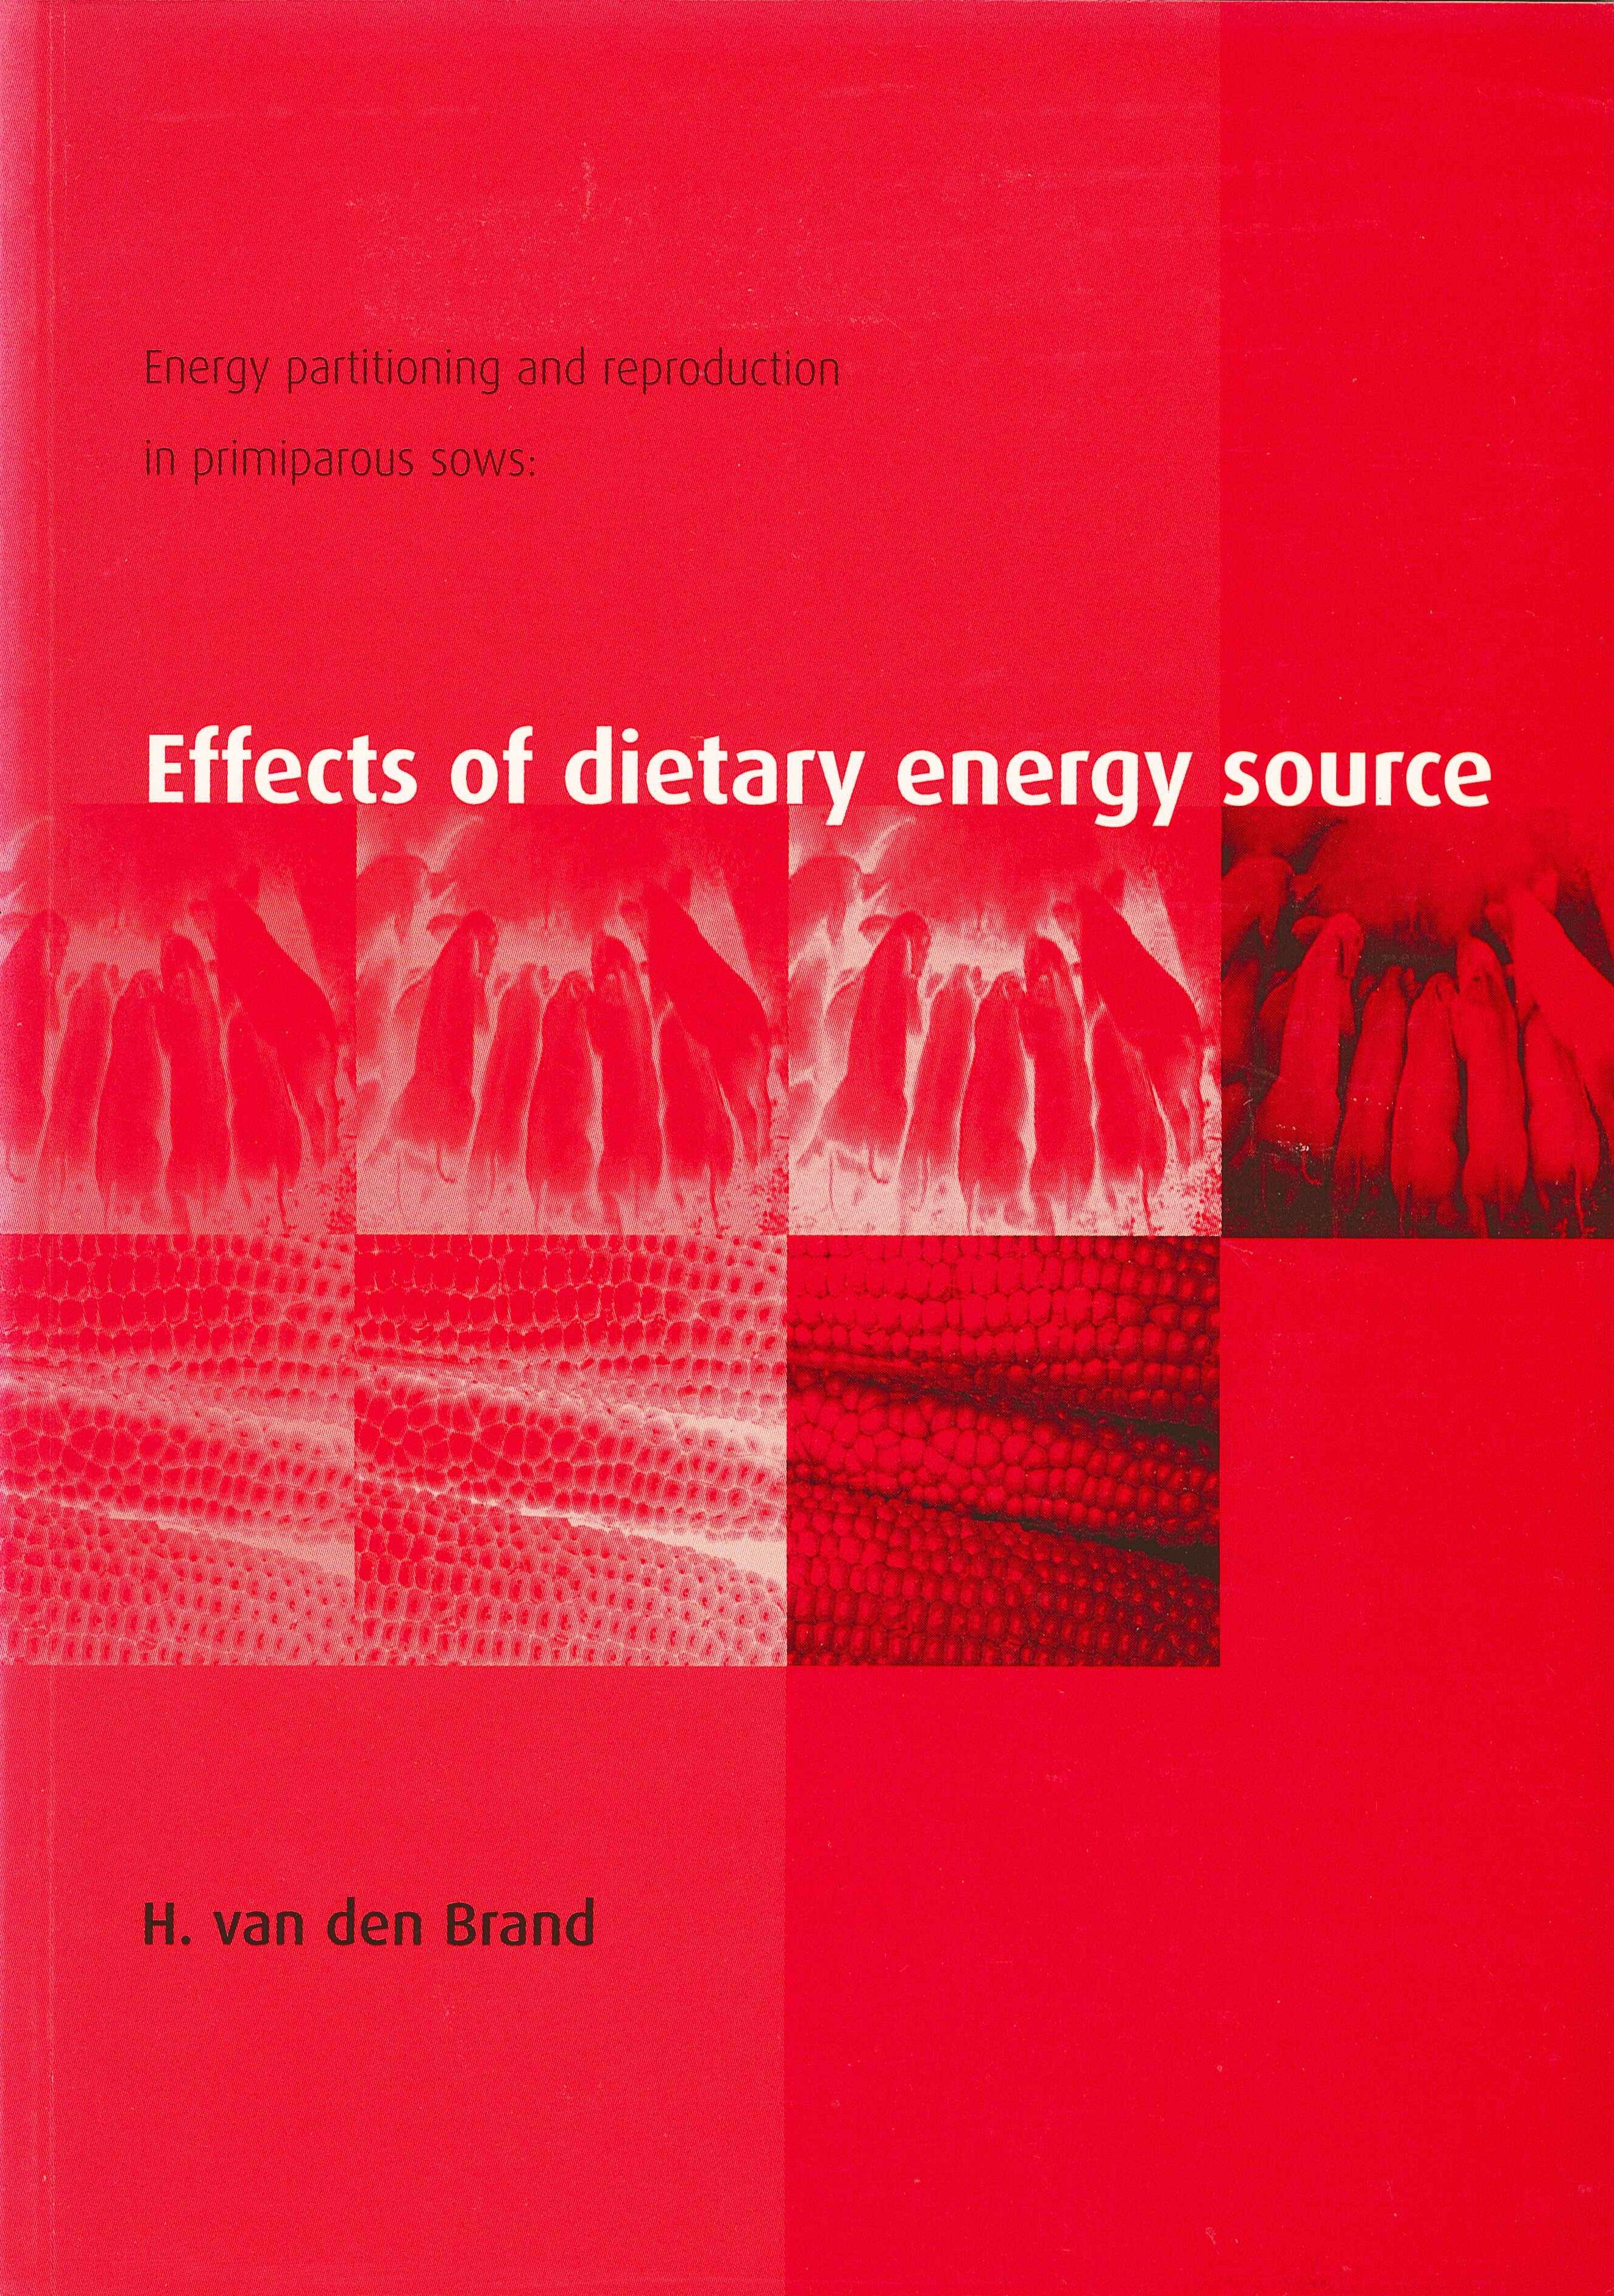 Phd thesis wageningen university | Proposal and dissertation help ...